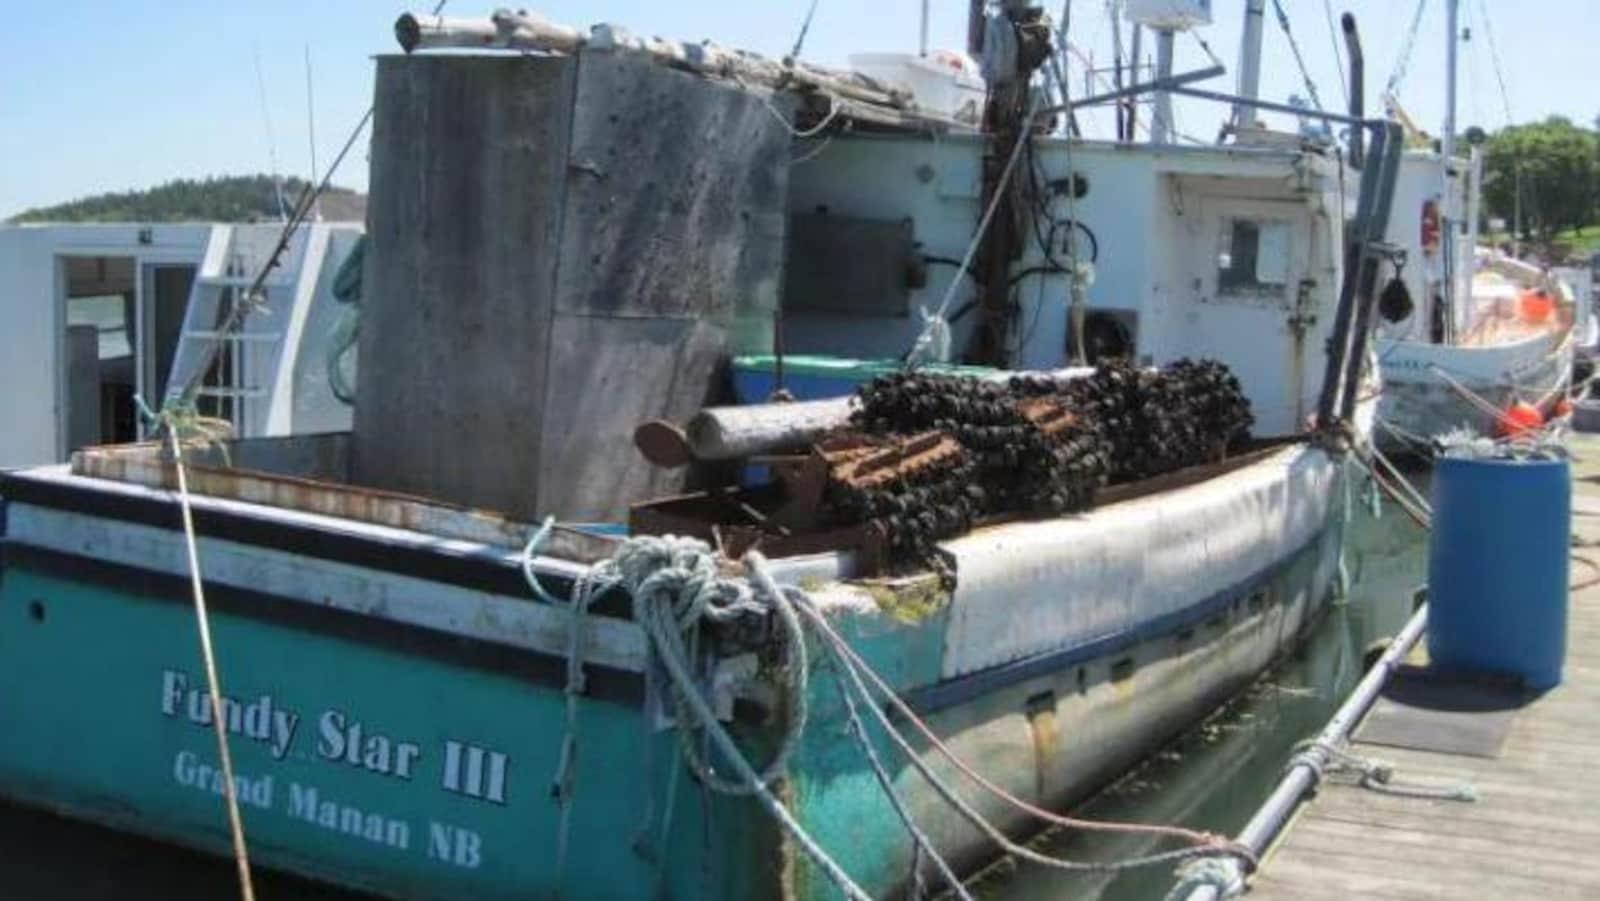 Le bateau Fundy Star III, avant qu'il ne soit démoli.